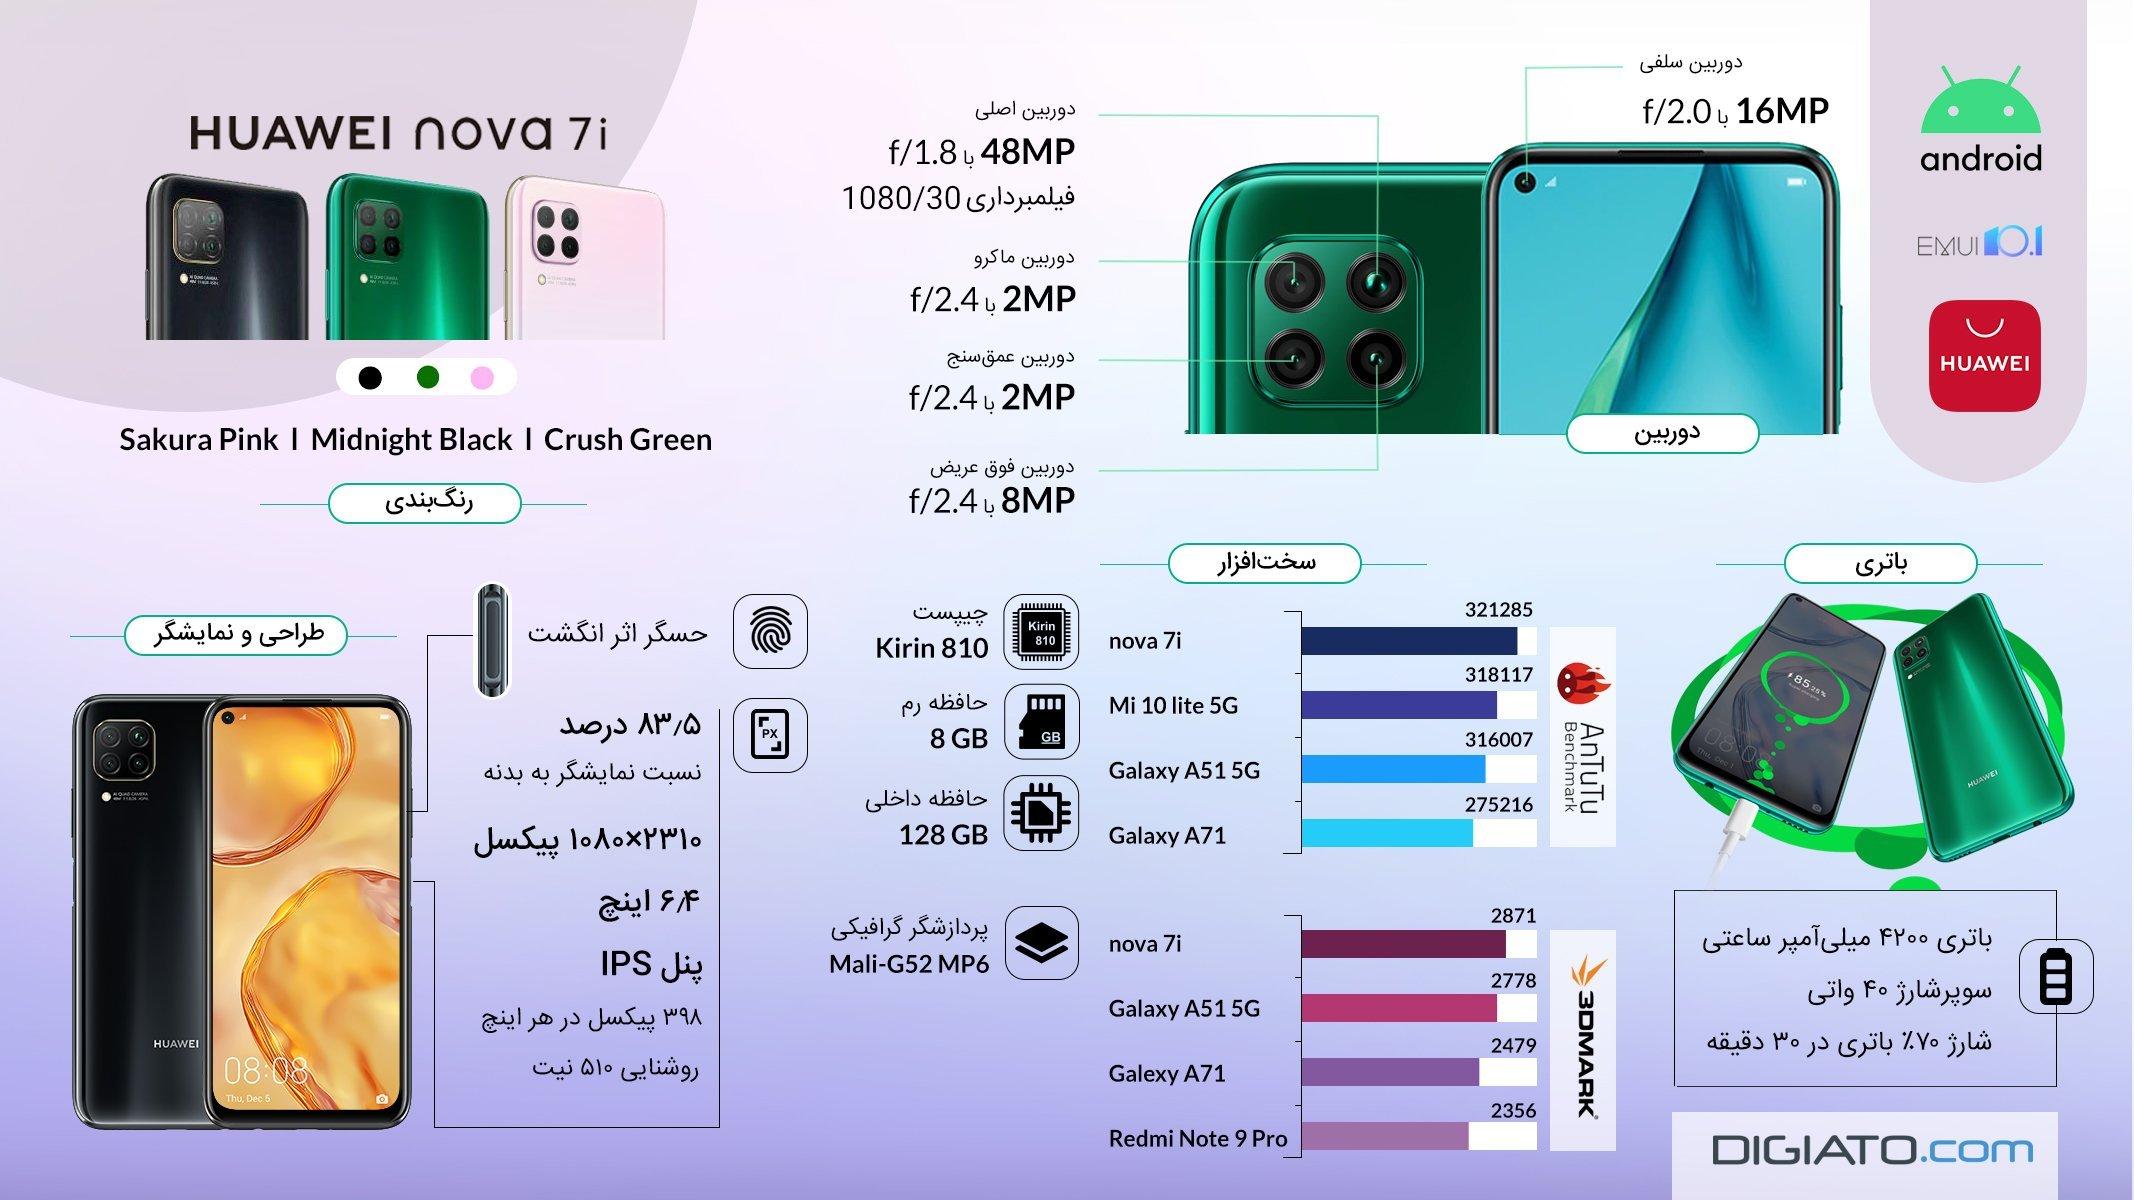 HUAWEI Nova 7i اینفوگرافیک: نگاهی به مشخصات گوشی هواوی نووا 7i اخبار IT